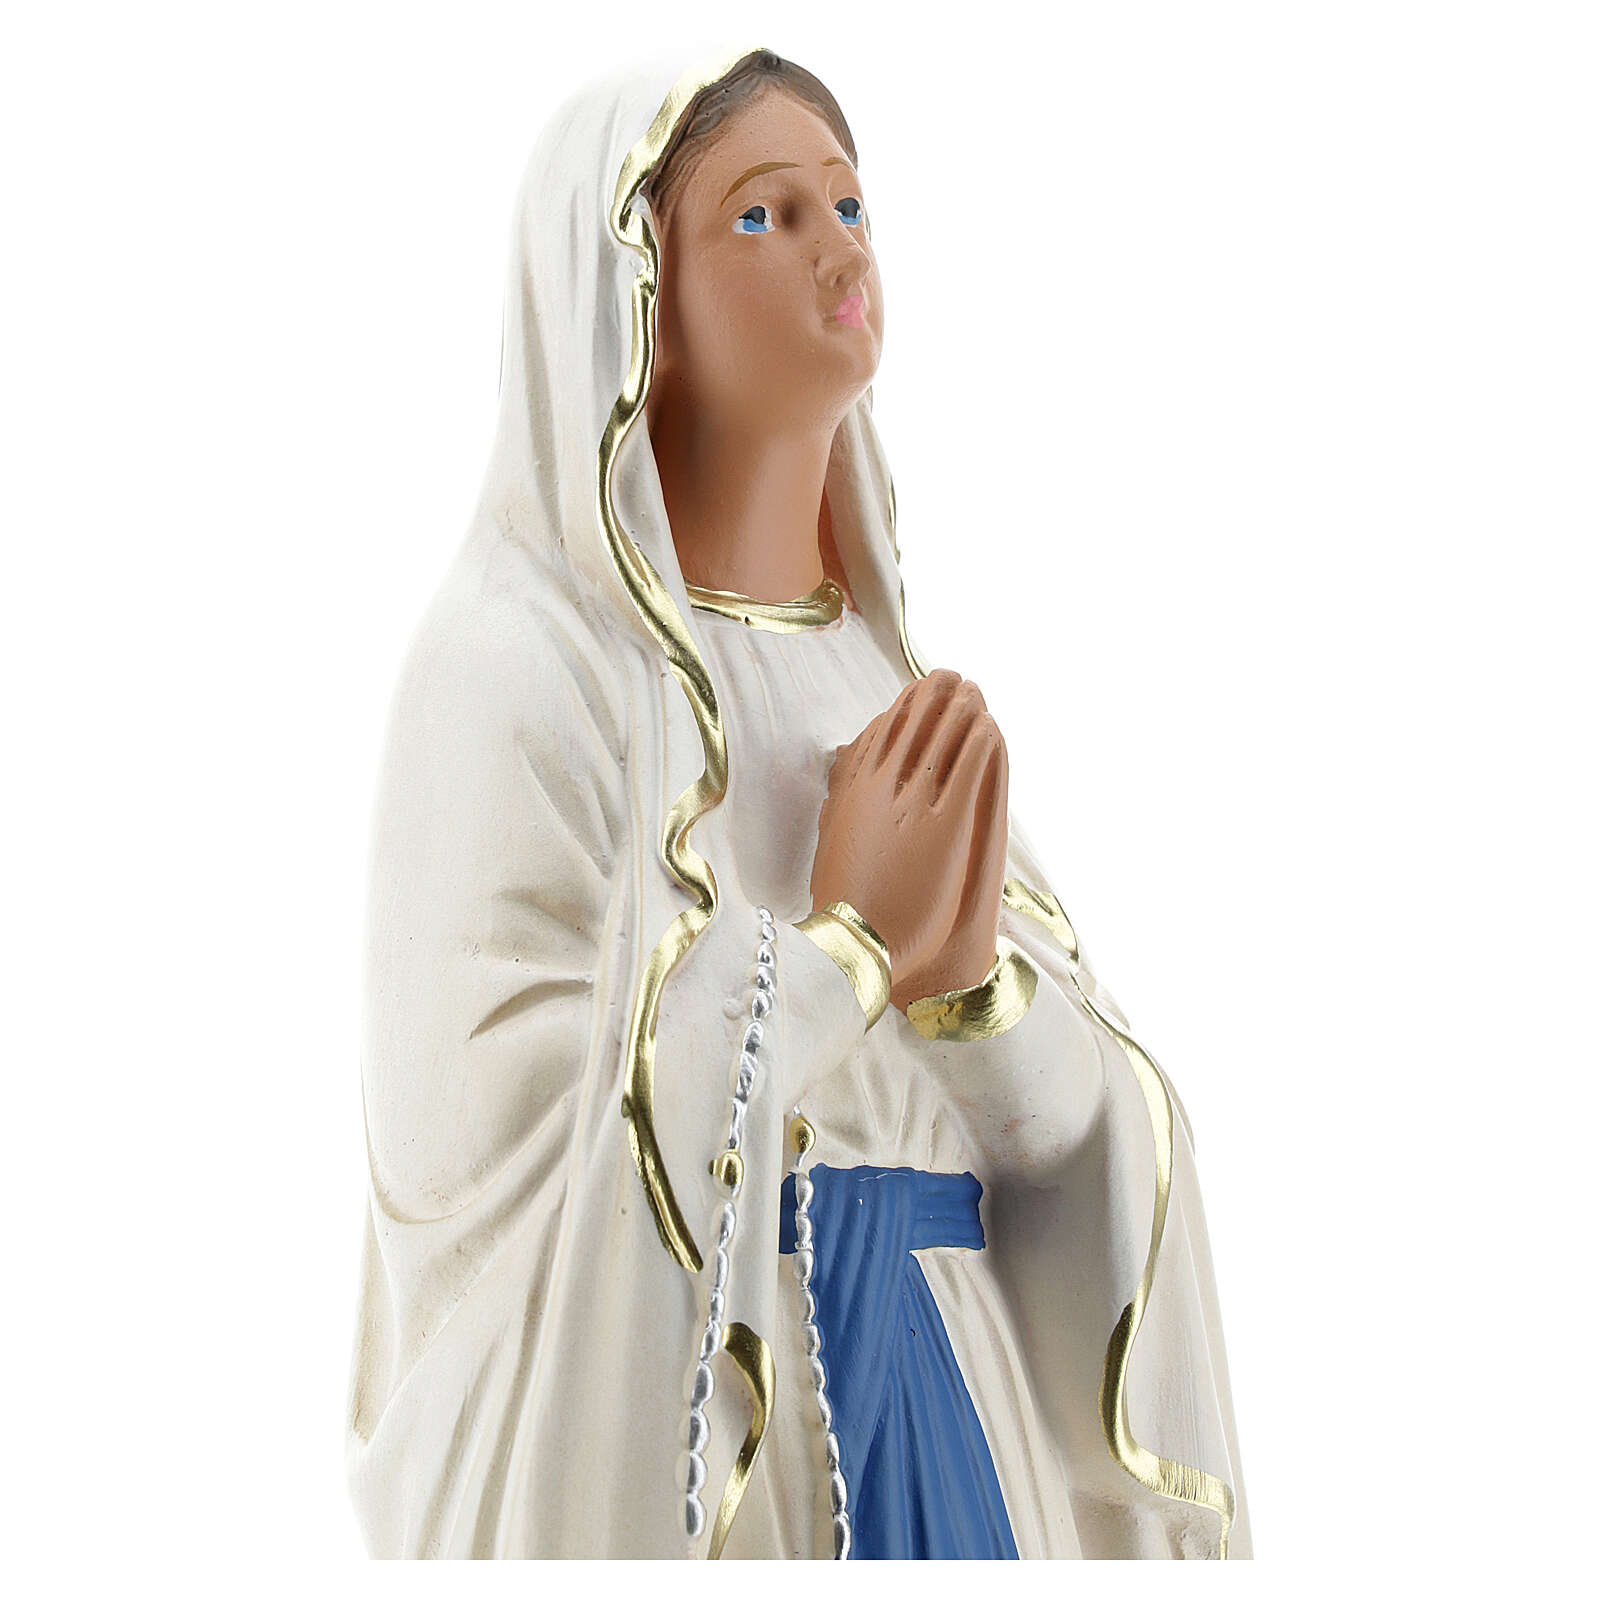 Our Lady of Lourdes 30 cm Arte Barsanti 4